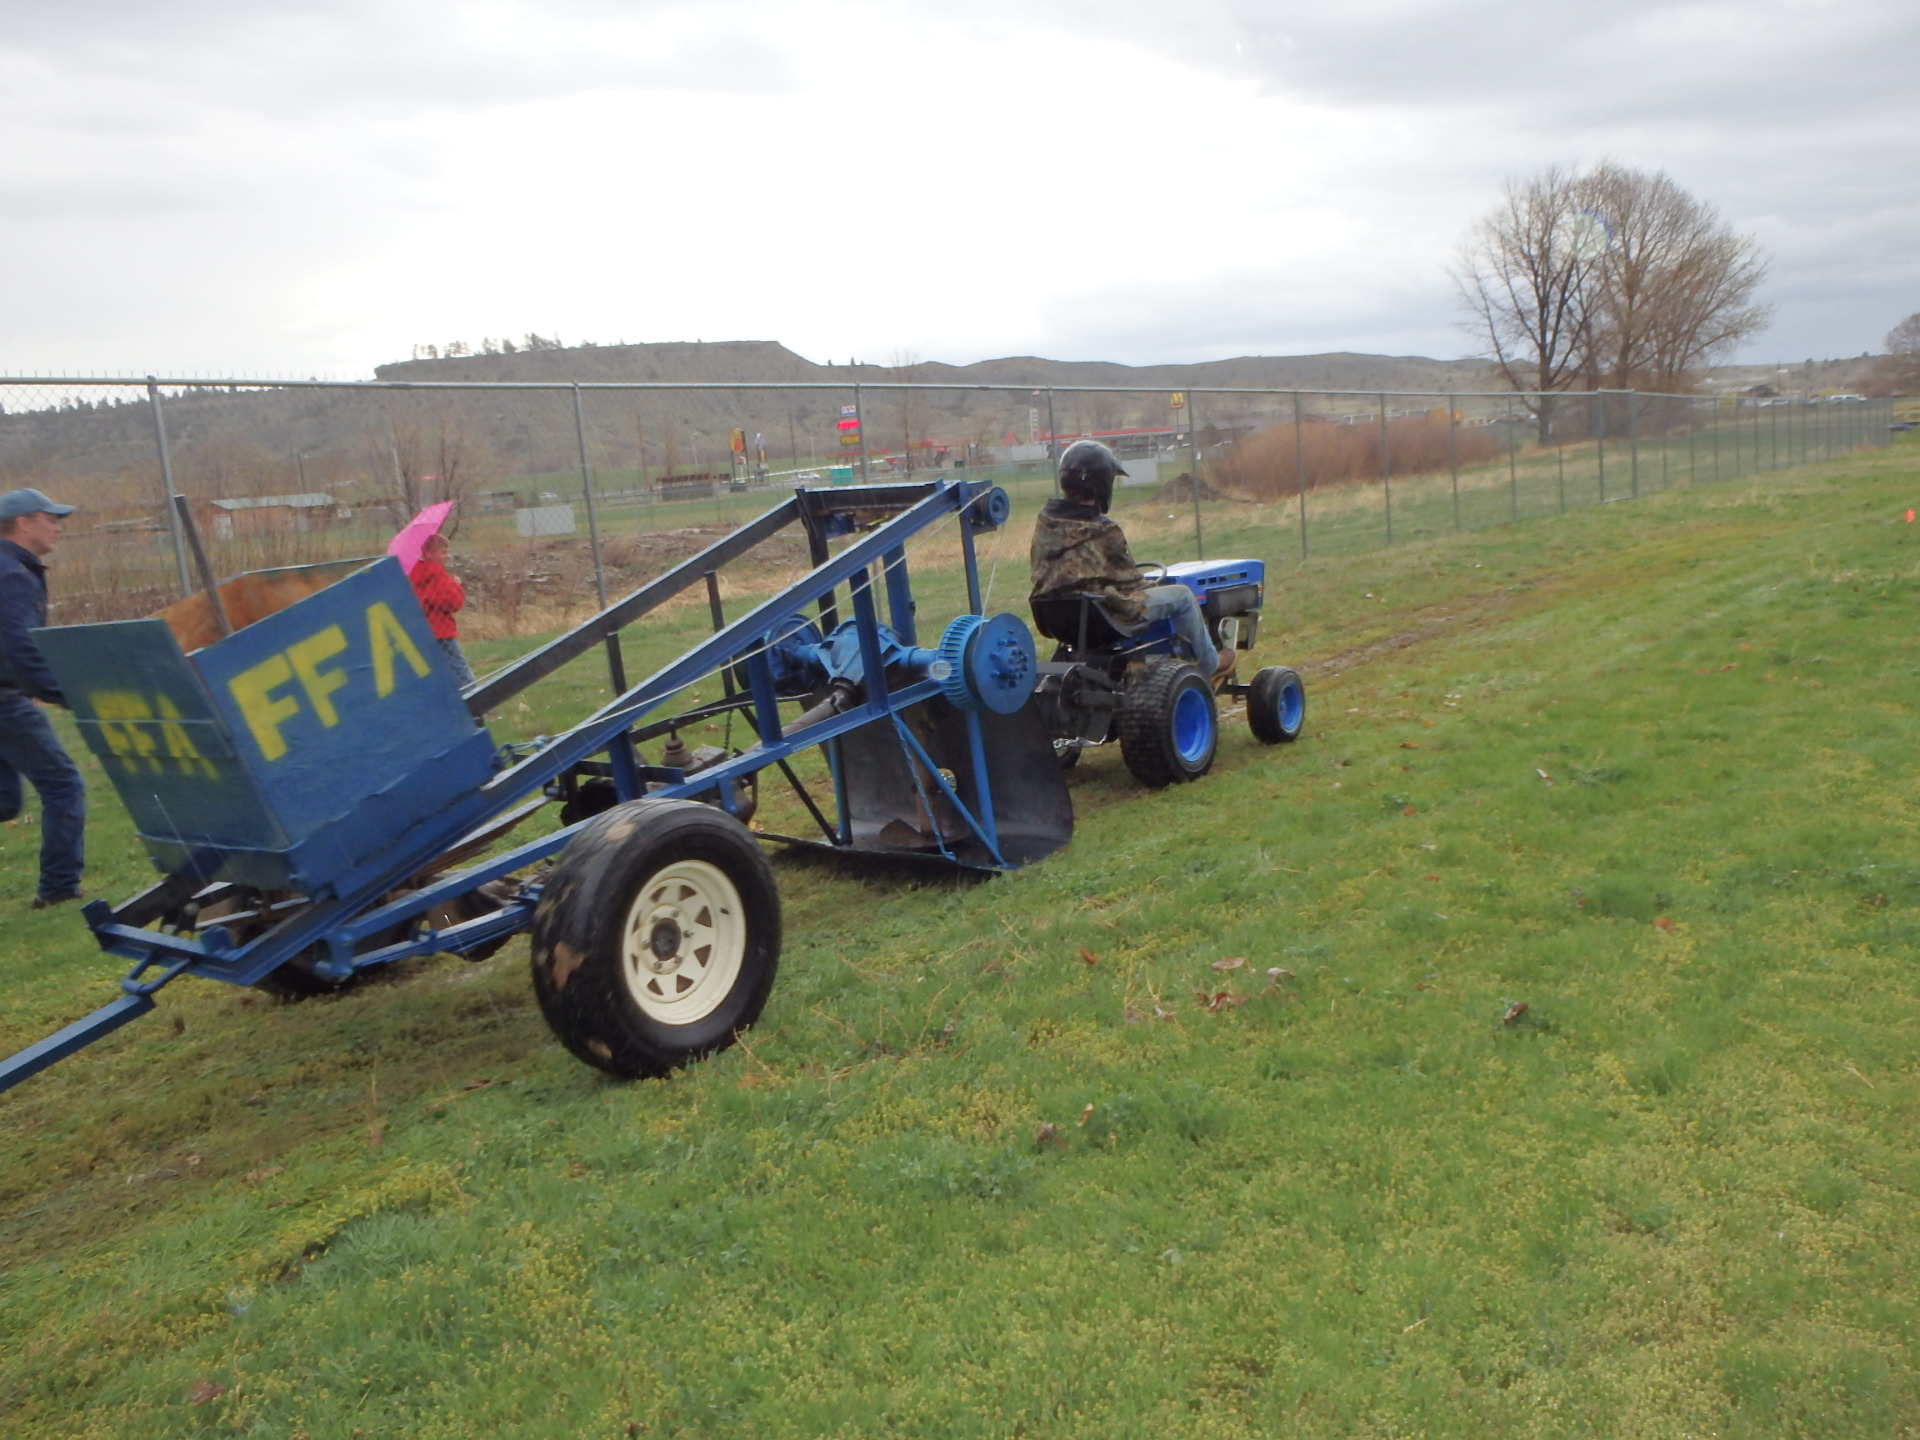 Columbus Ffa Lawn Mower Tractor Pull Kghl